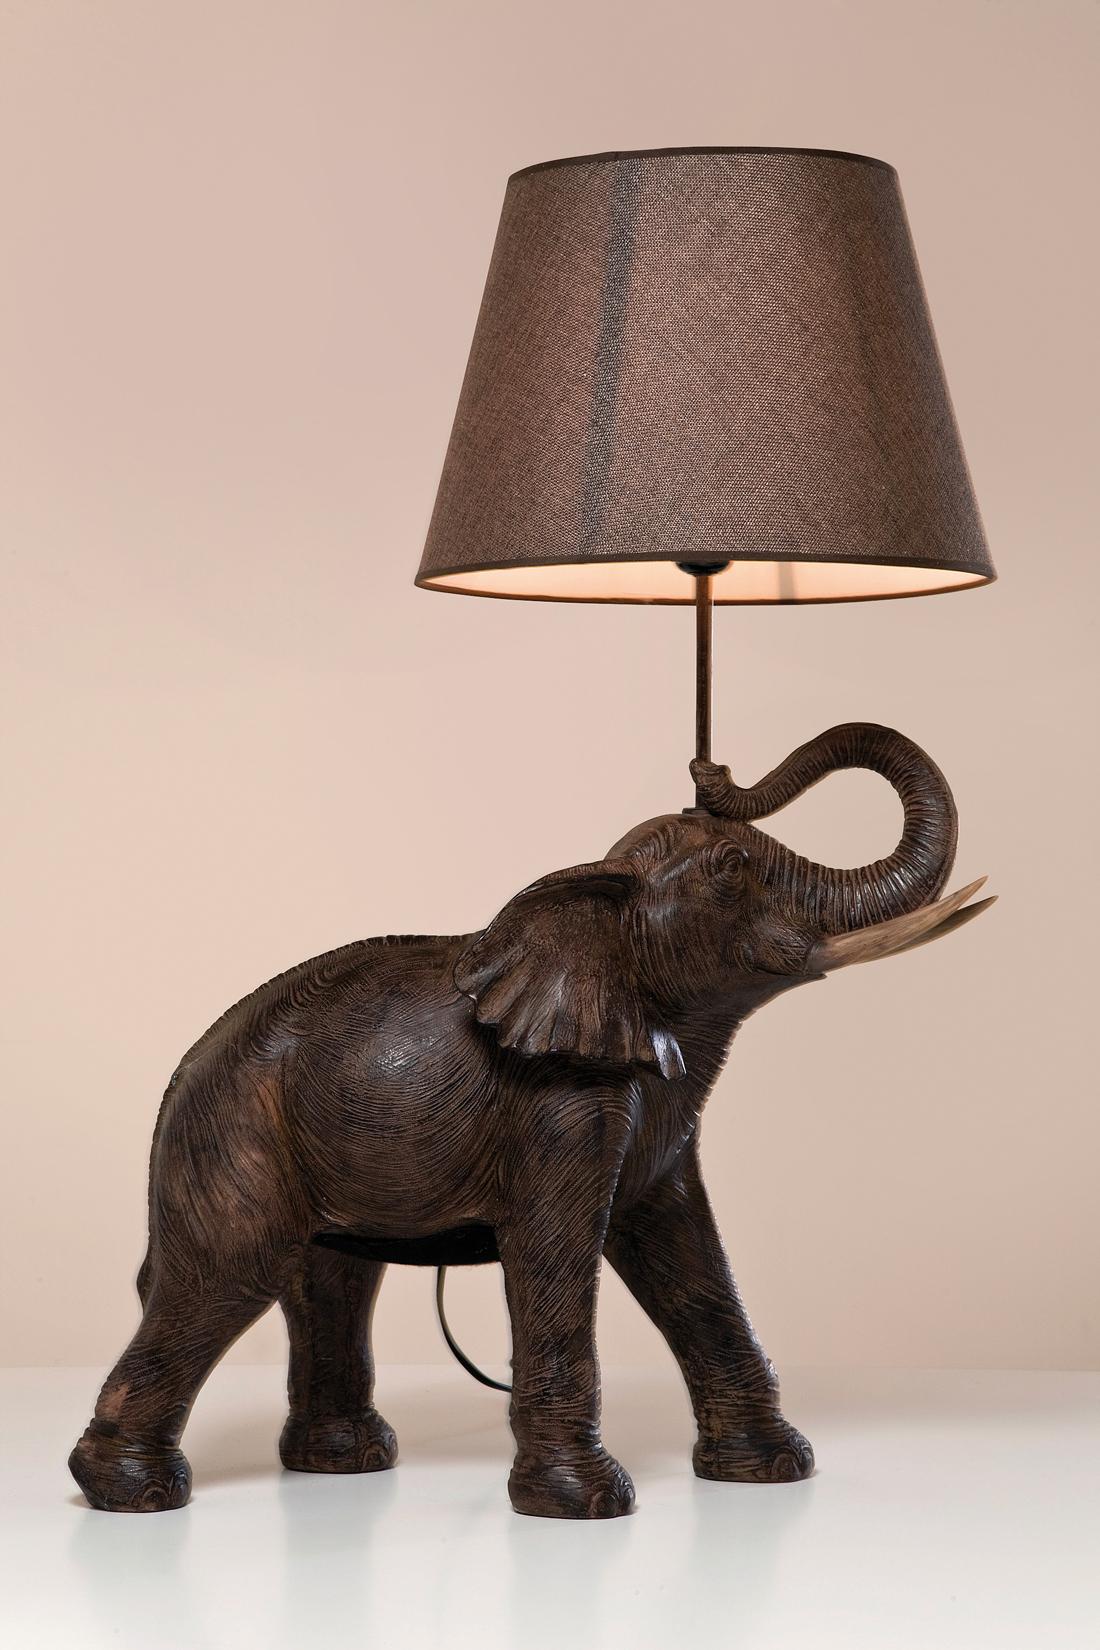 Tischlampe Elephant Safari R I C O Interior